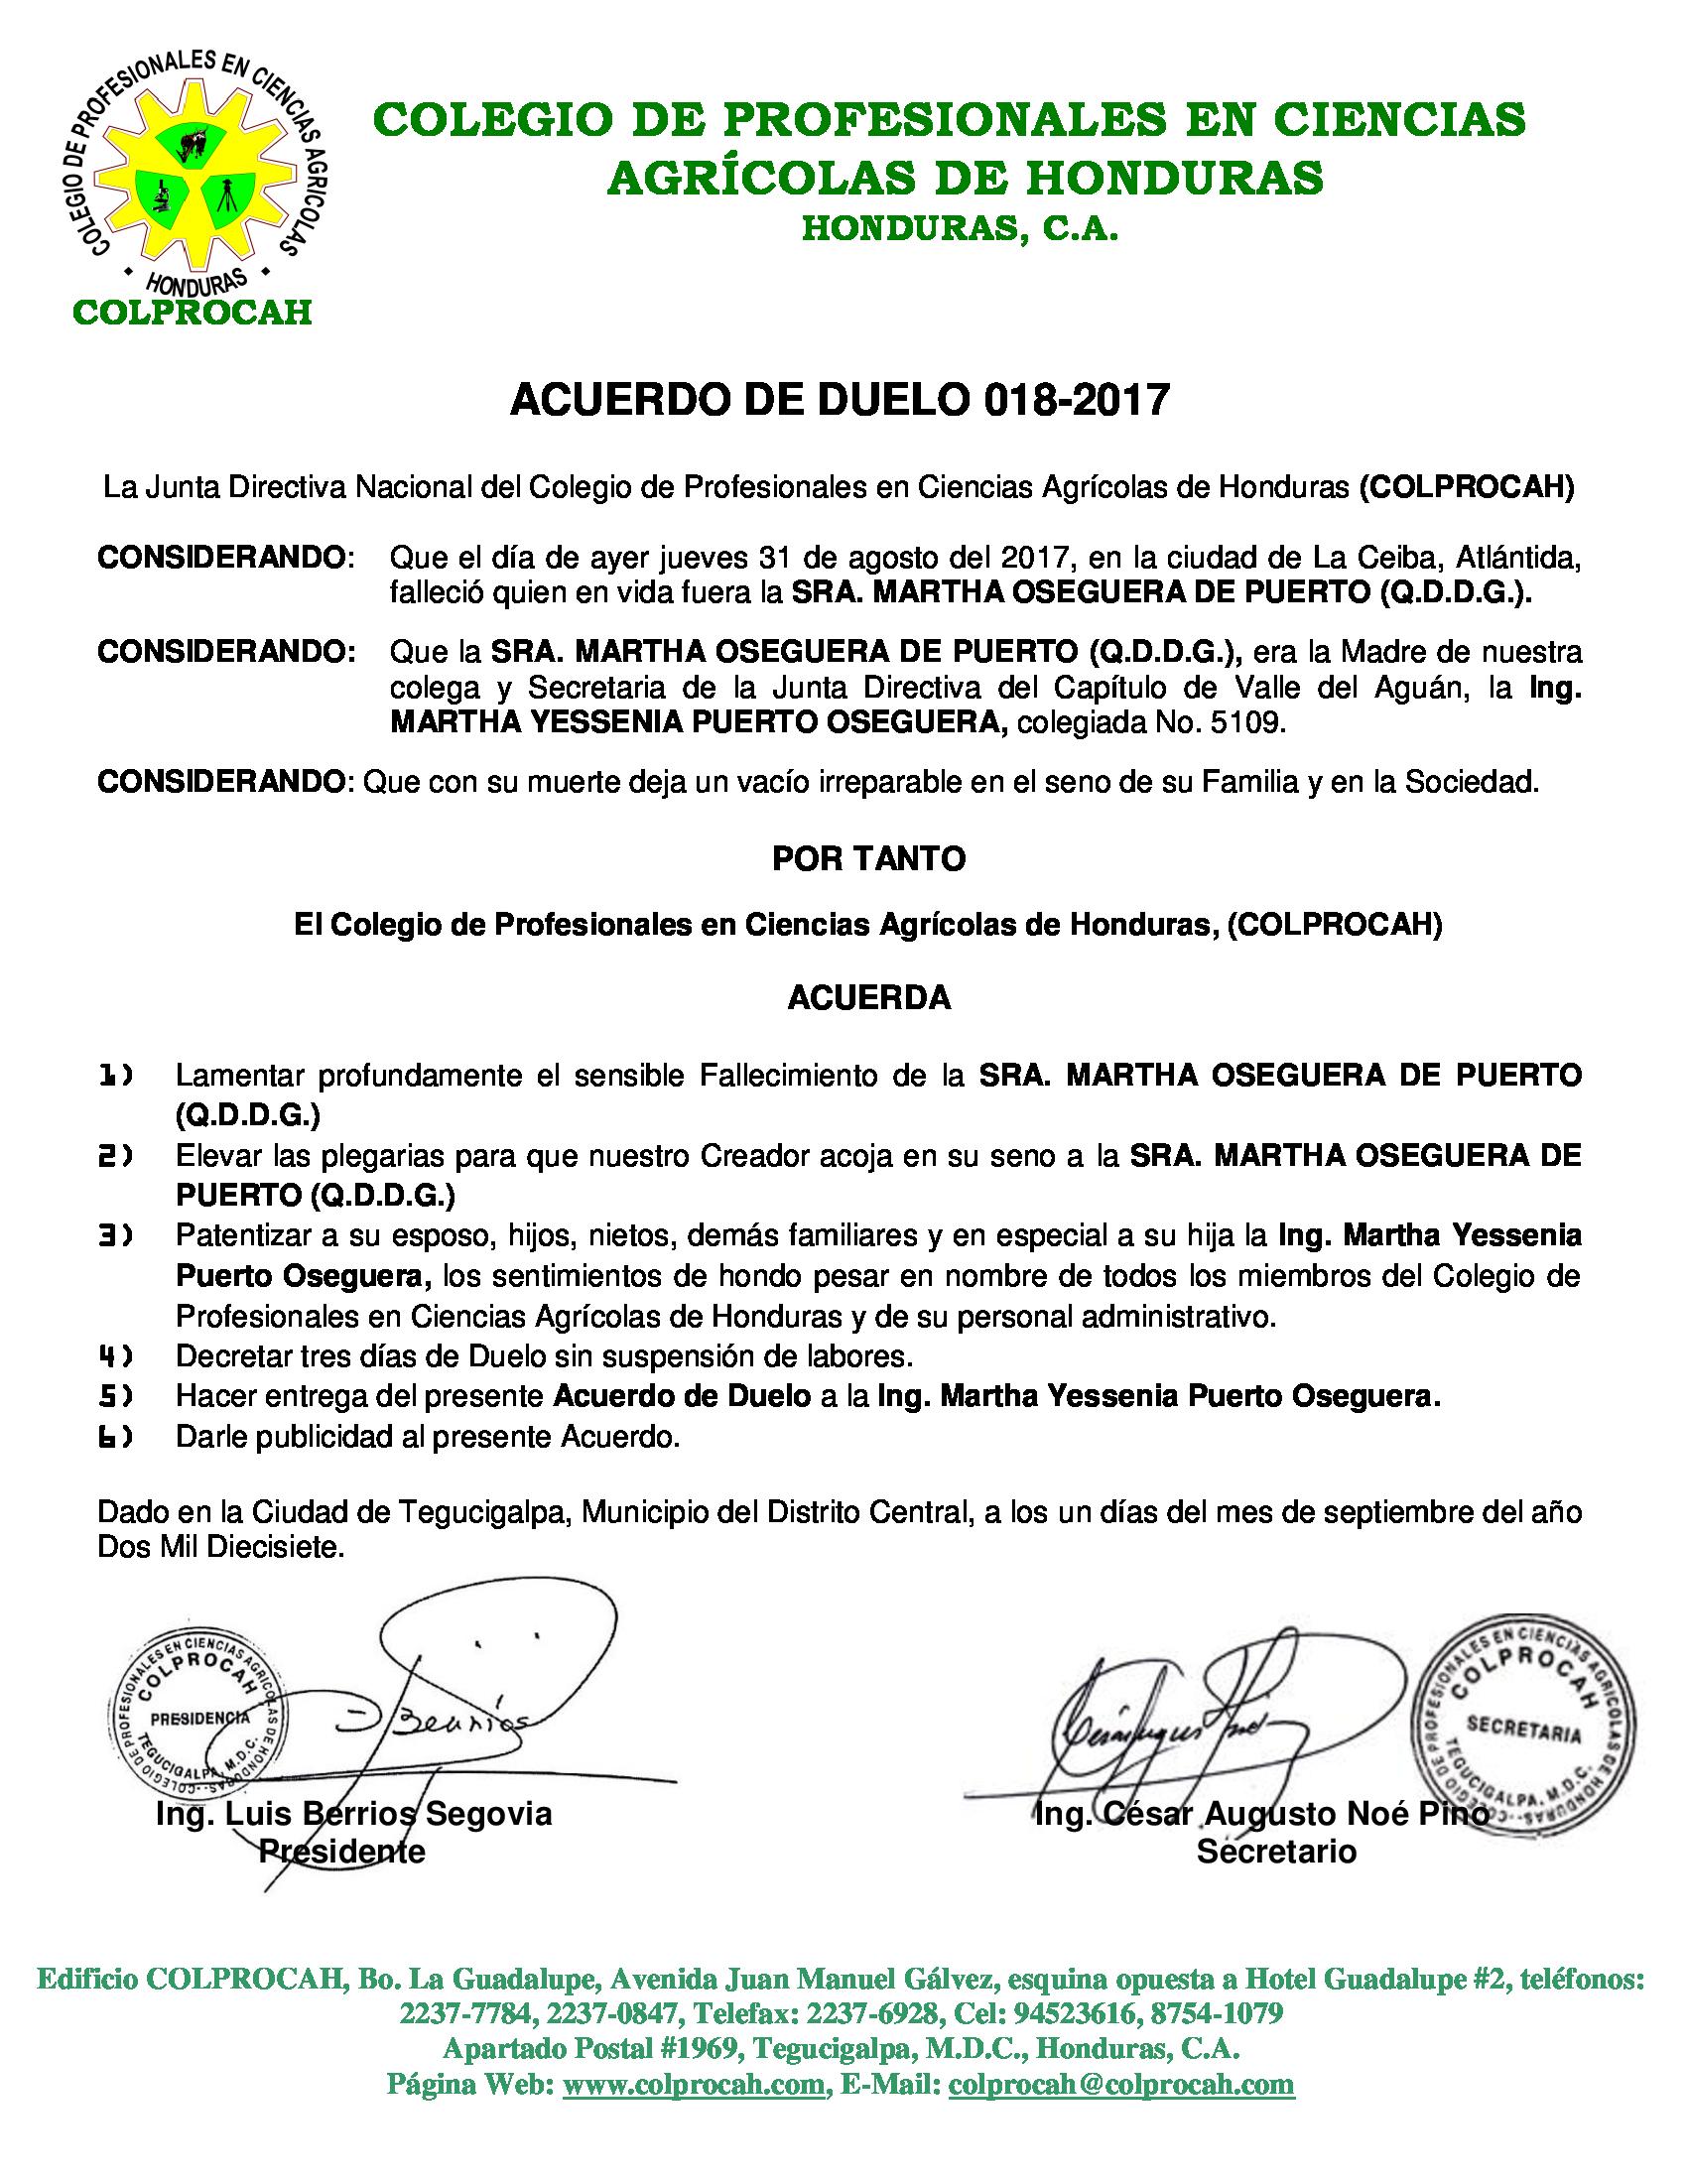 Acuerdo de Duelo 018 SRA. MARTHA OSEGUERA DE PUERTO (MADRE MARTHA PUERTO O.)